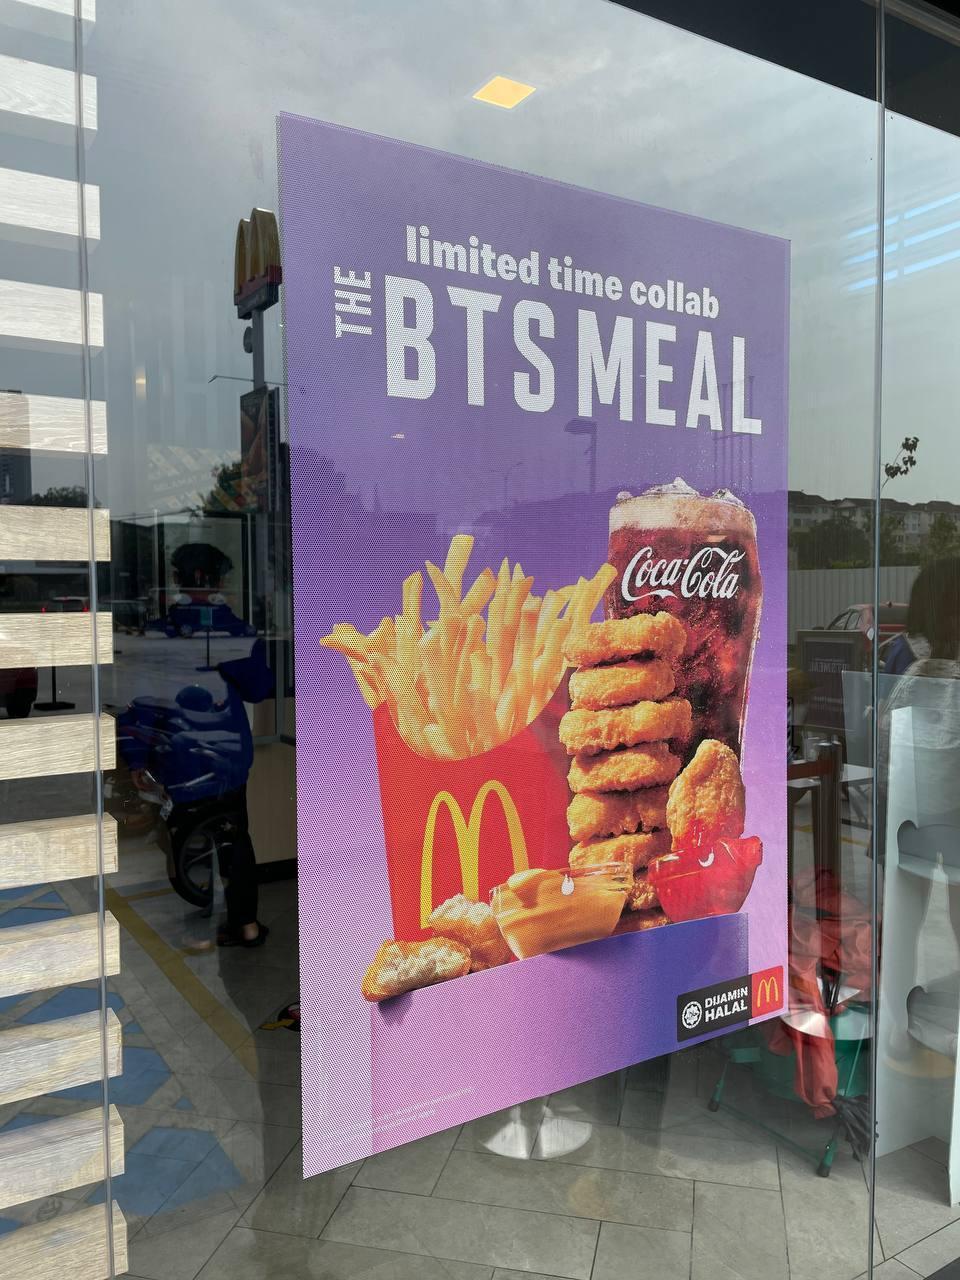 bts meal poster